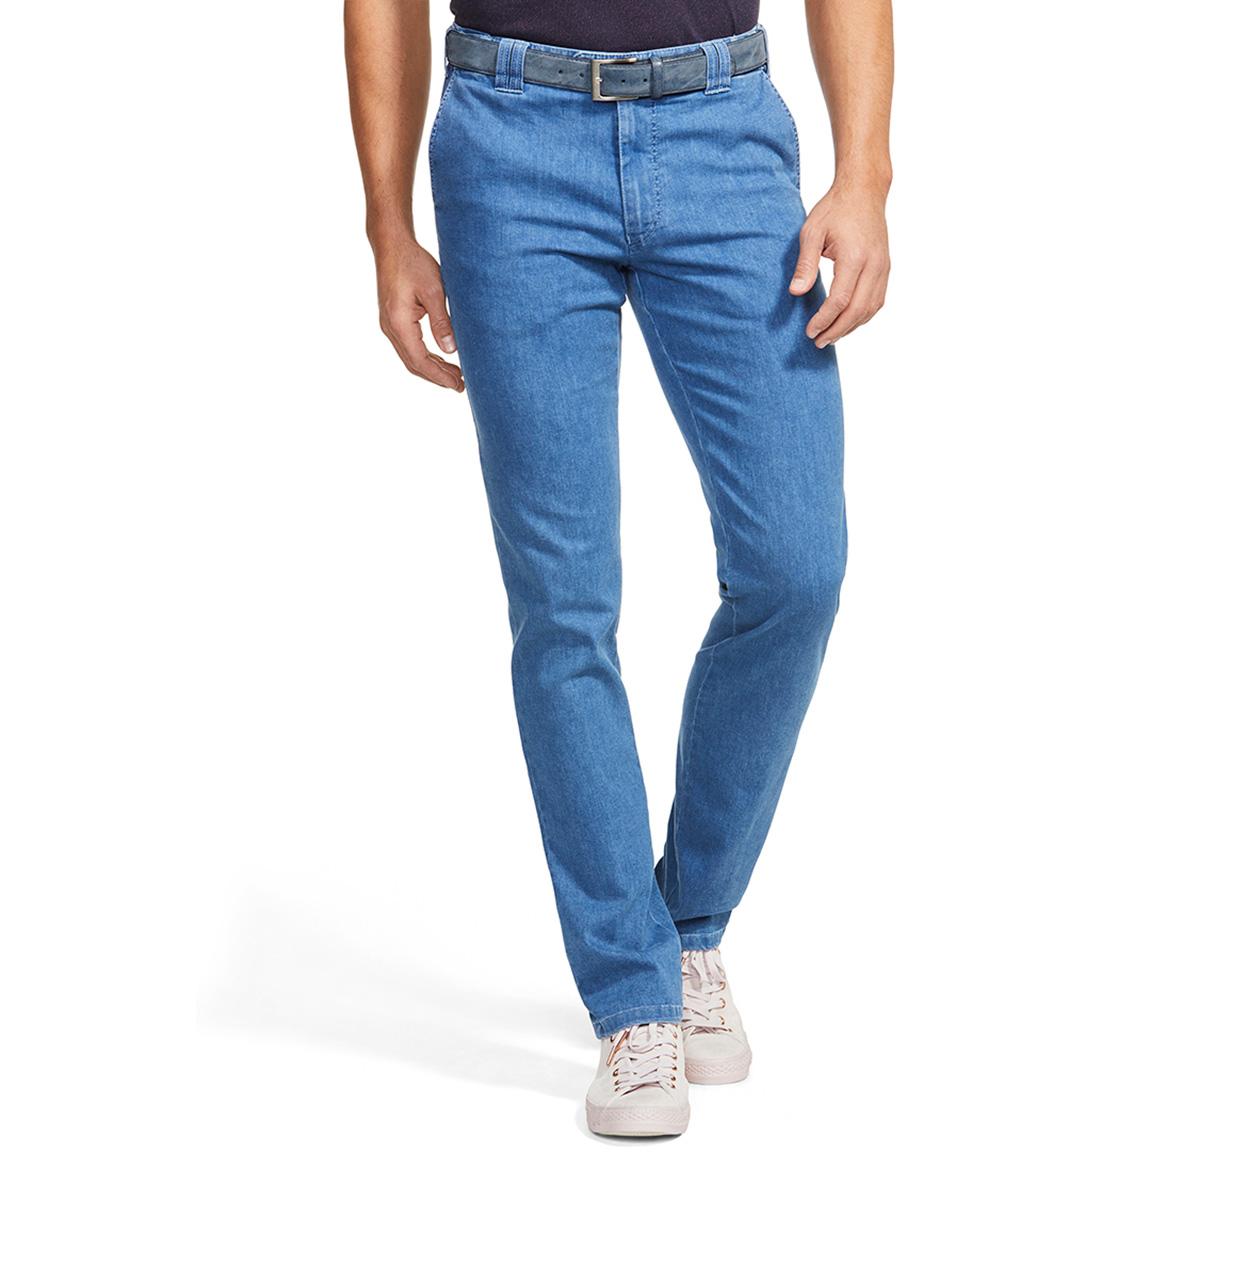 Meyer Jeans 1271412200 16 blau 1271412200 blauw Maat 52